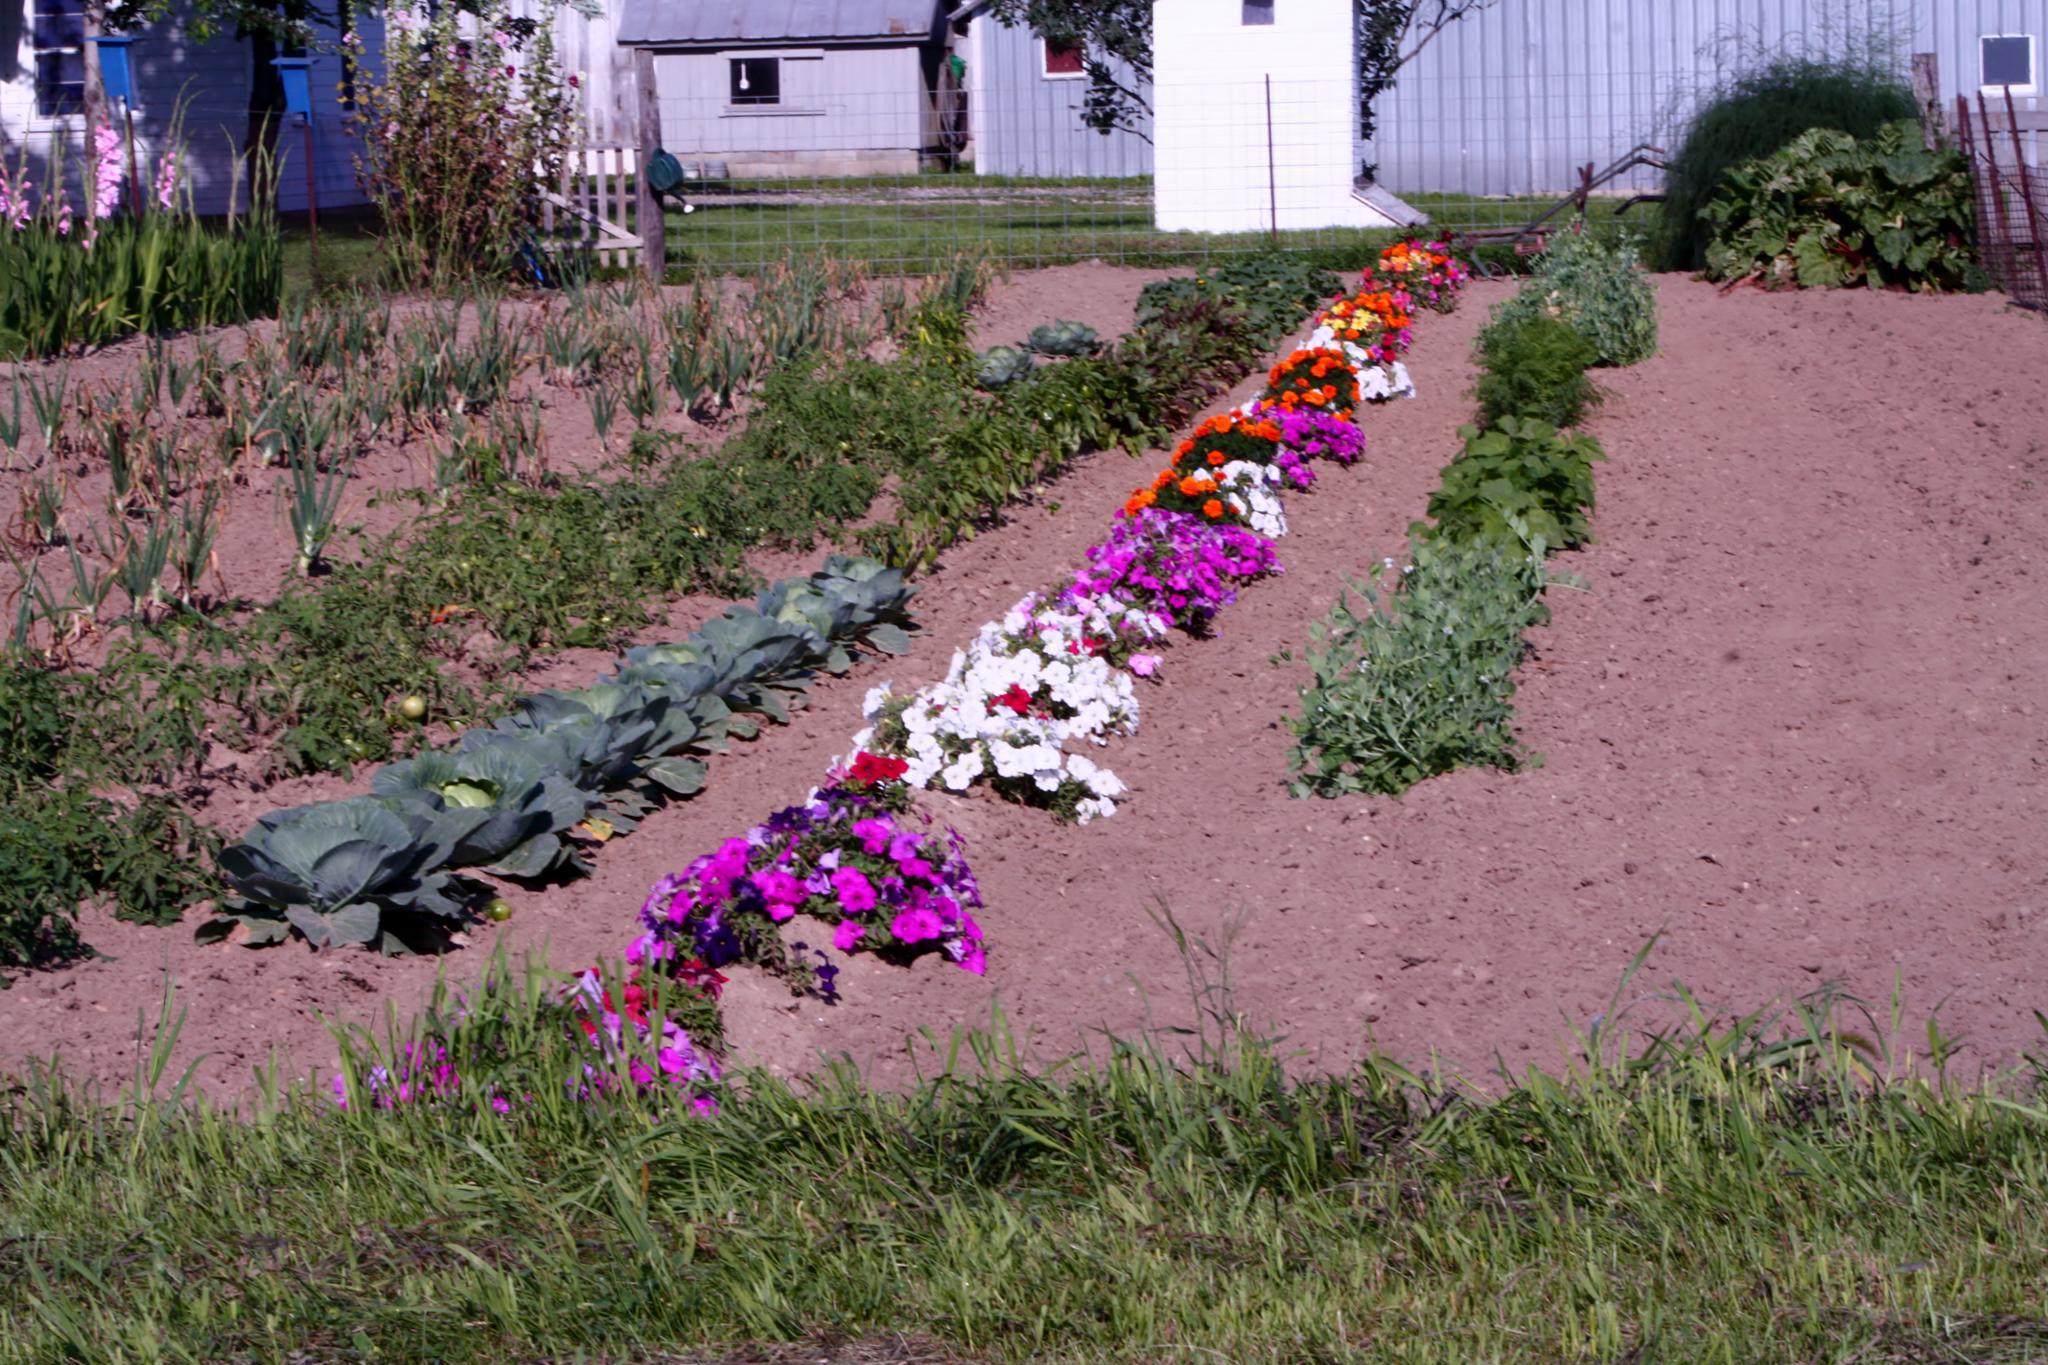 Amish Garden by cindy.martin.7503